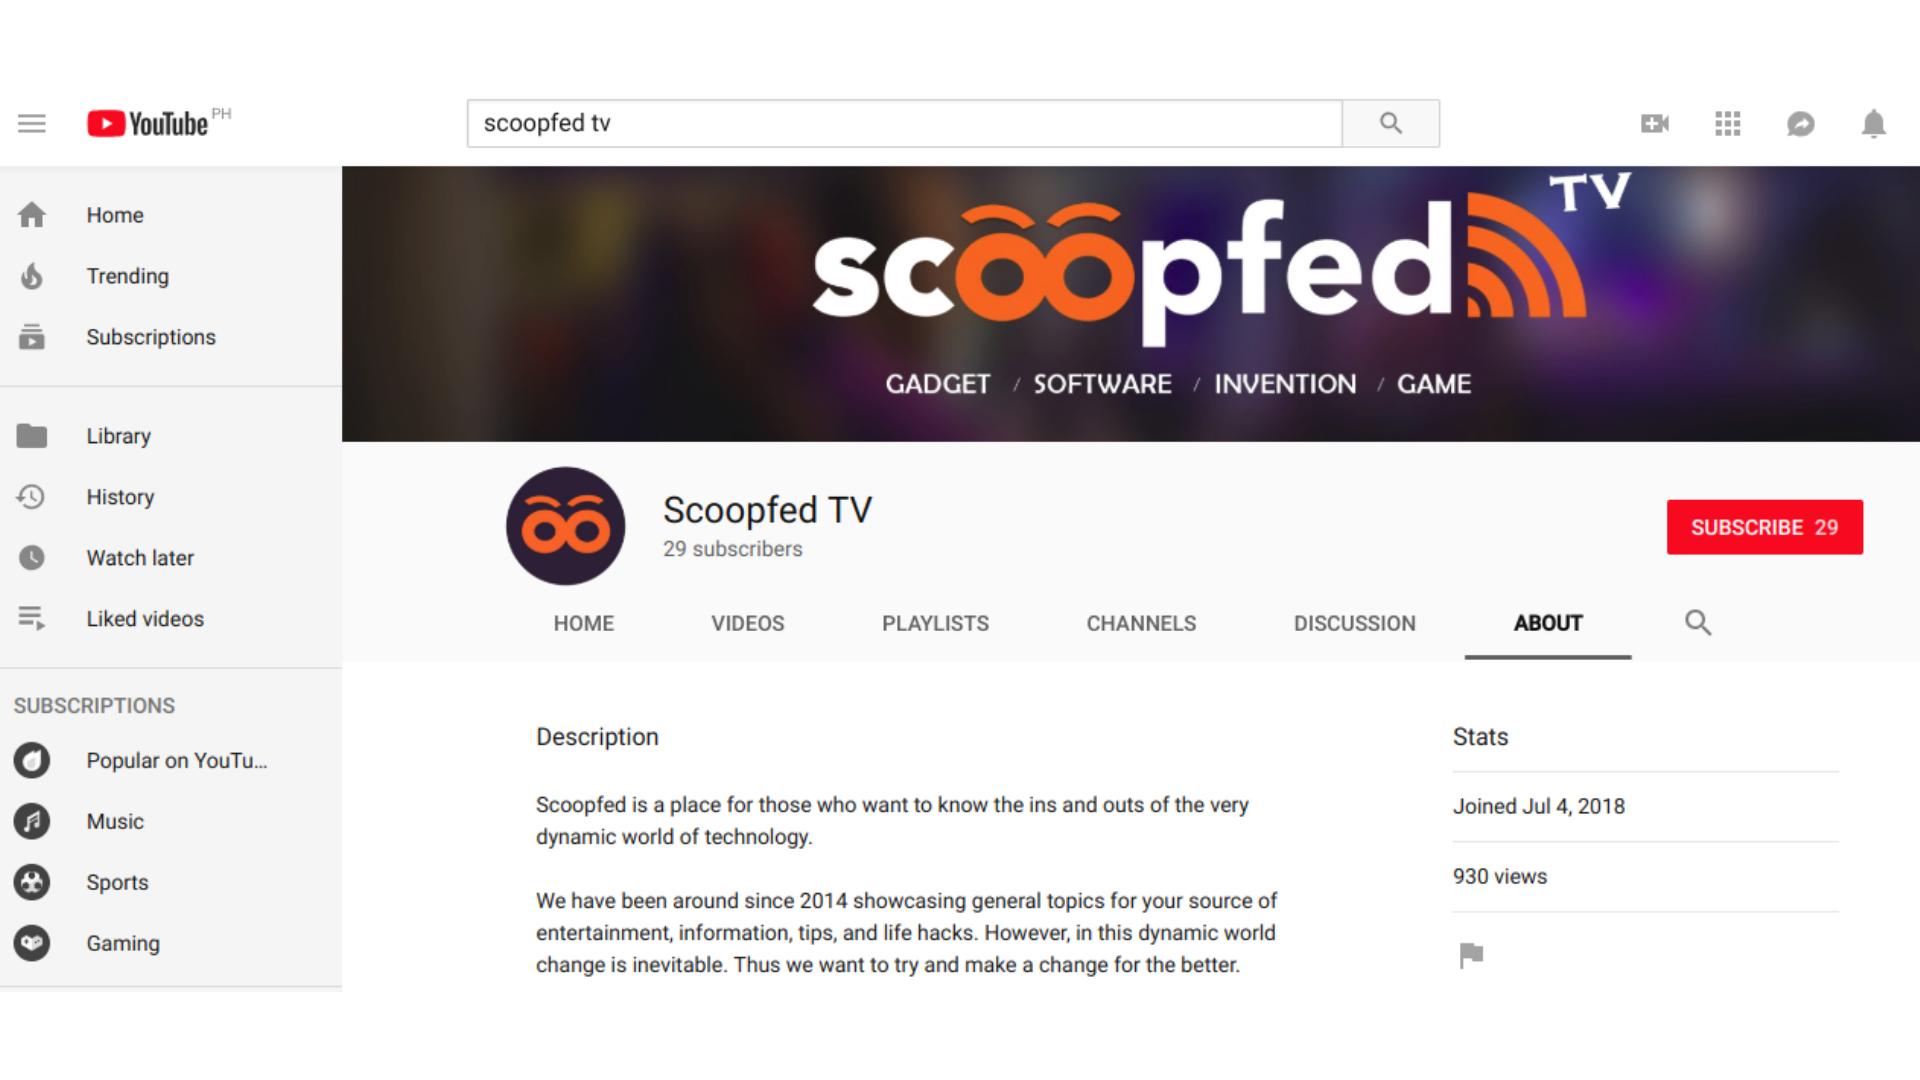 Complete YouTube profile